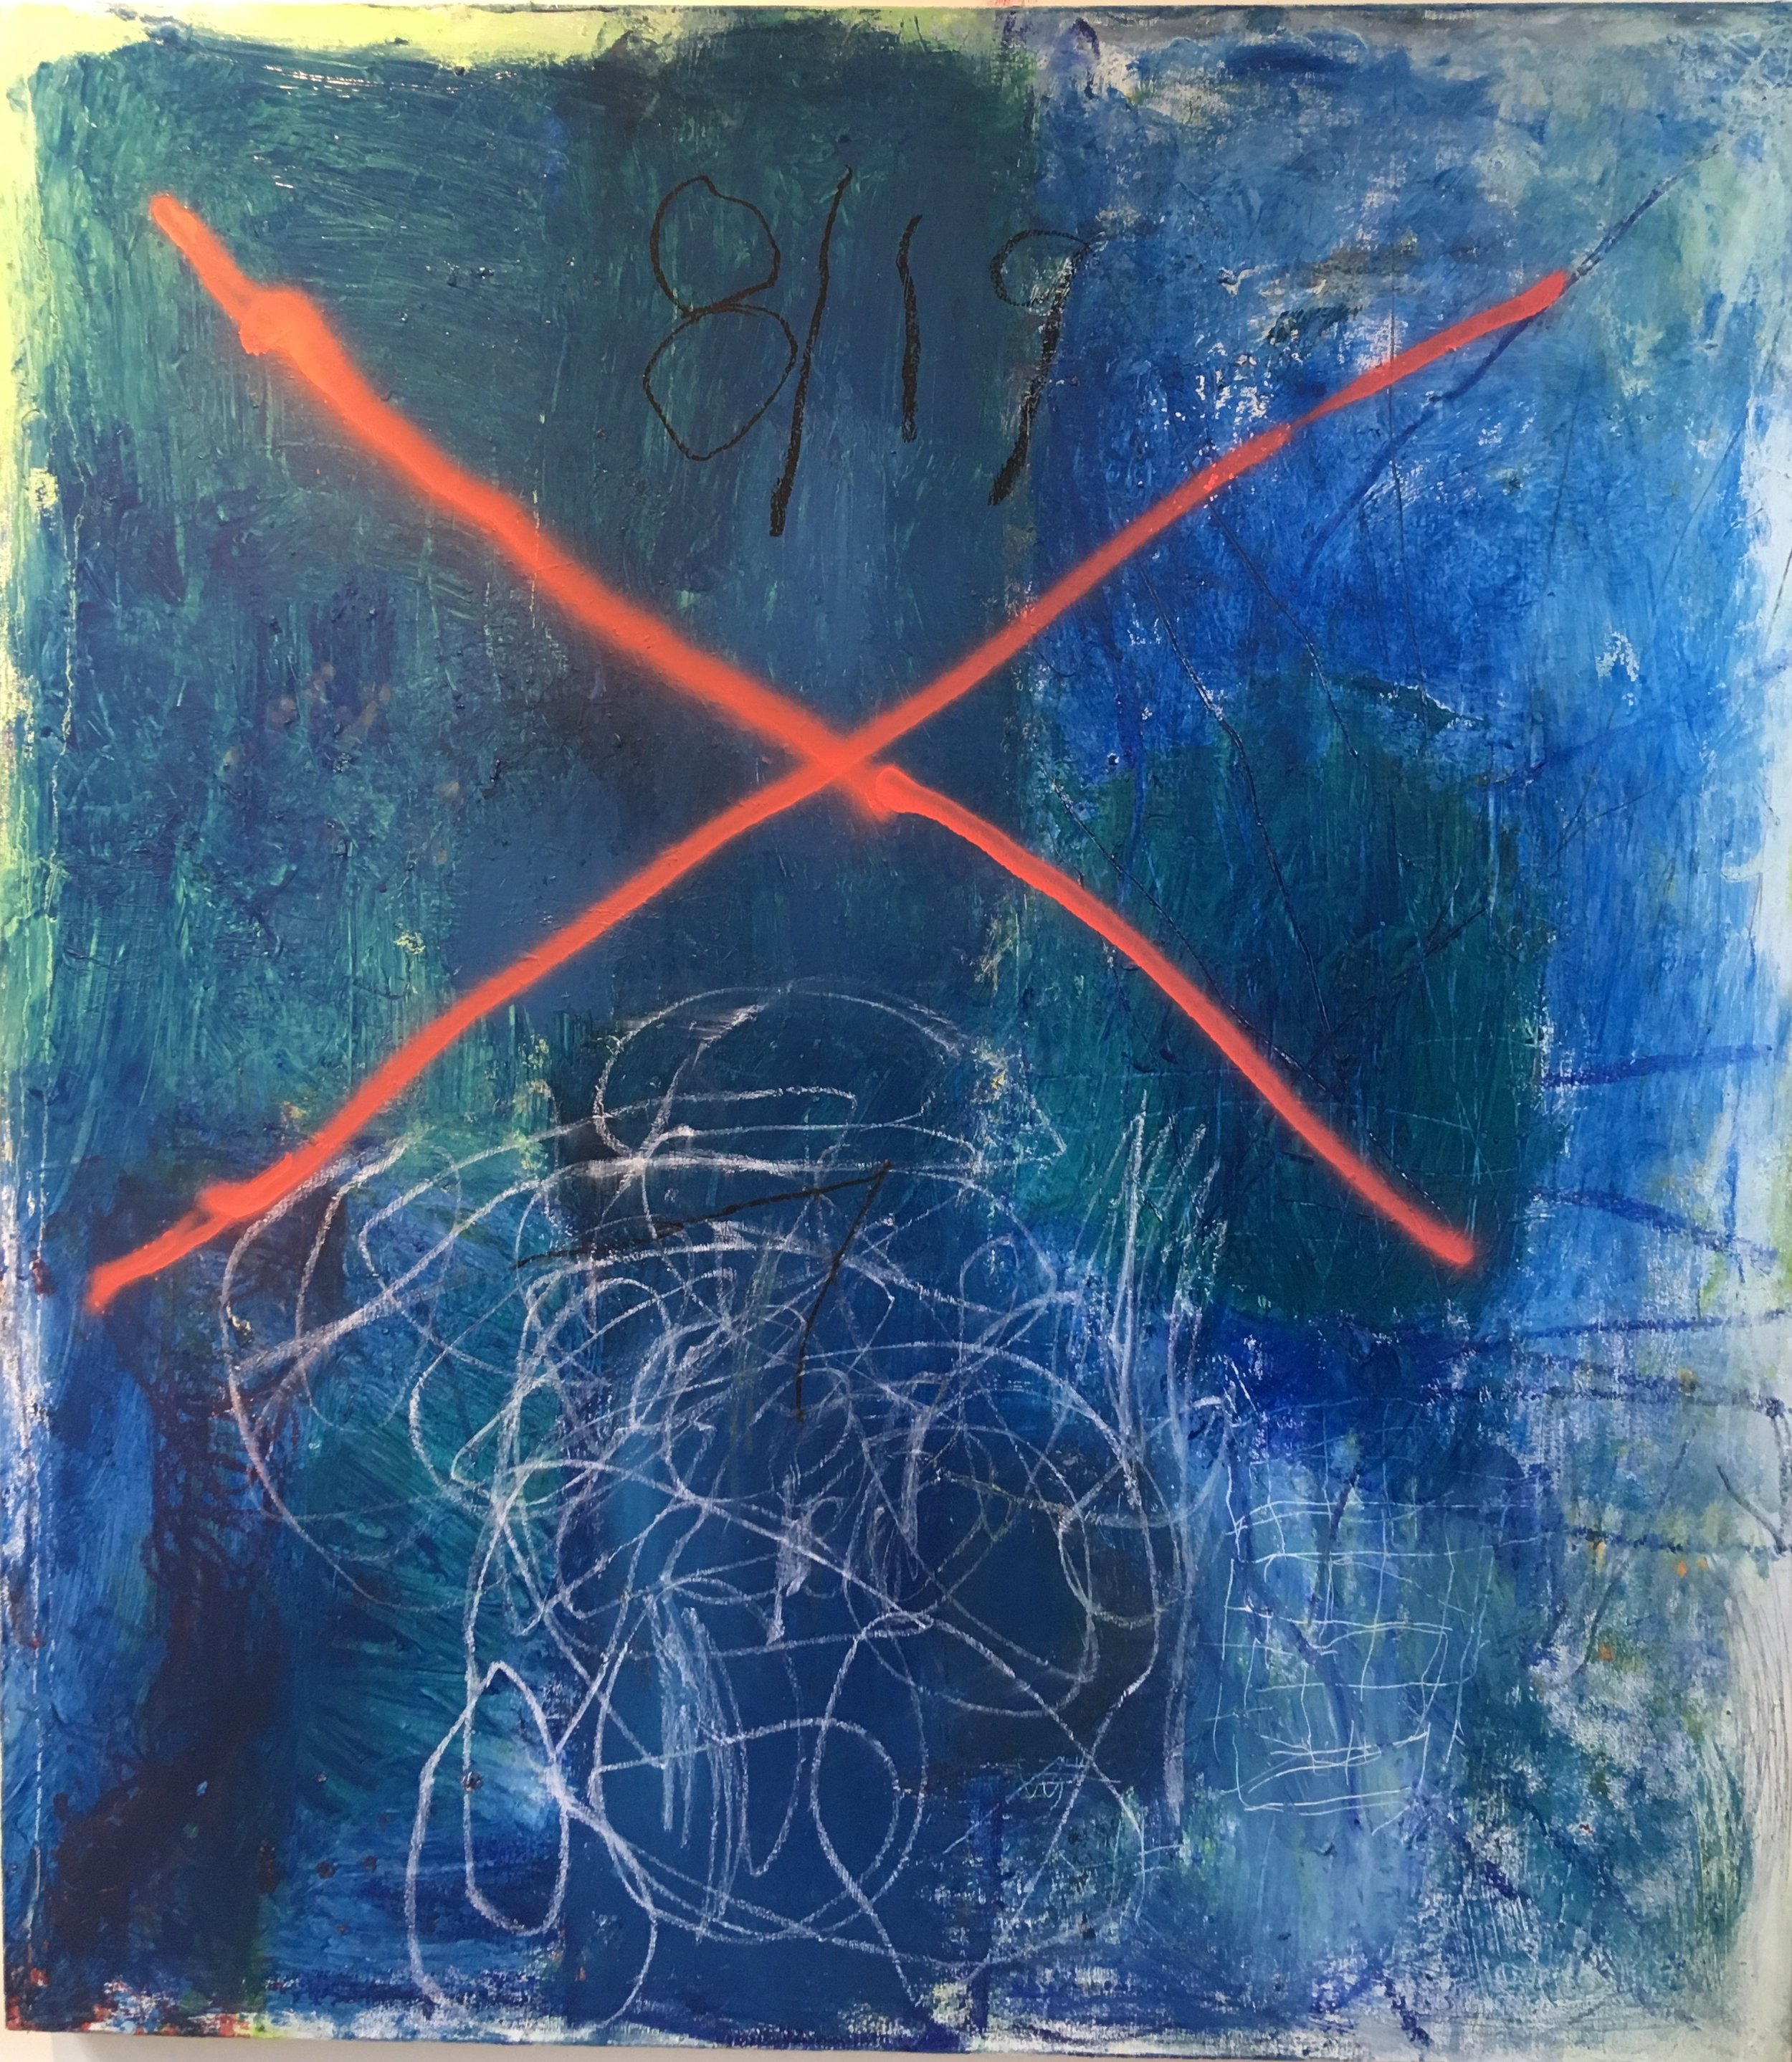 El Paso 52x48 in oil, spray , chalk on canvas 2019